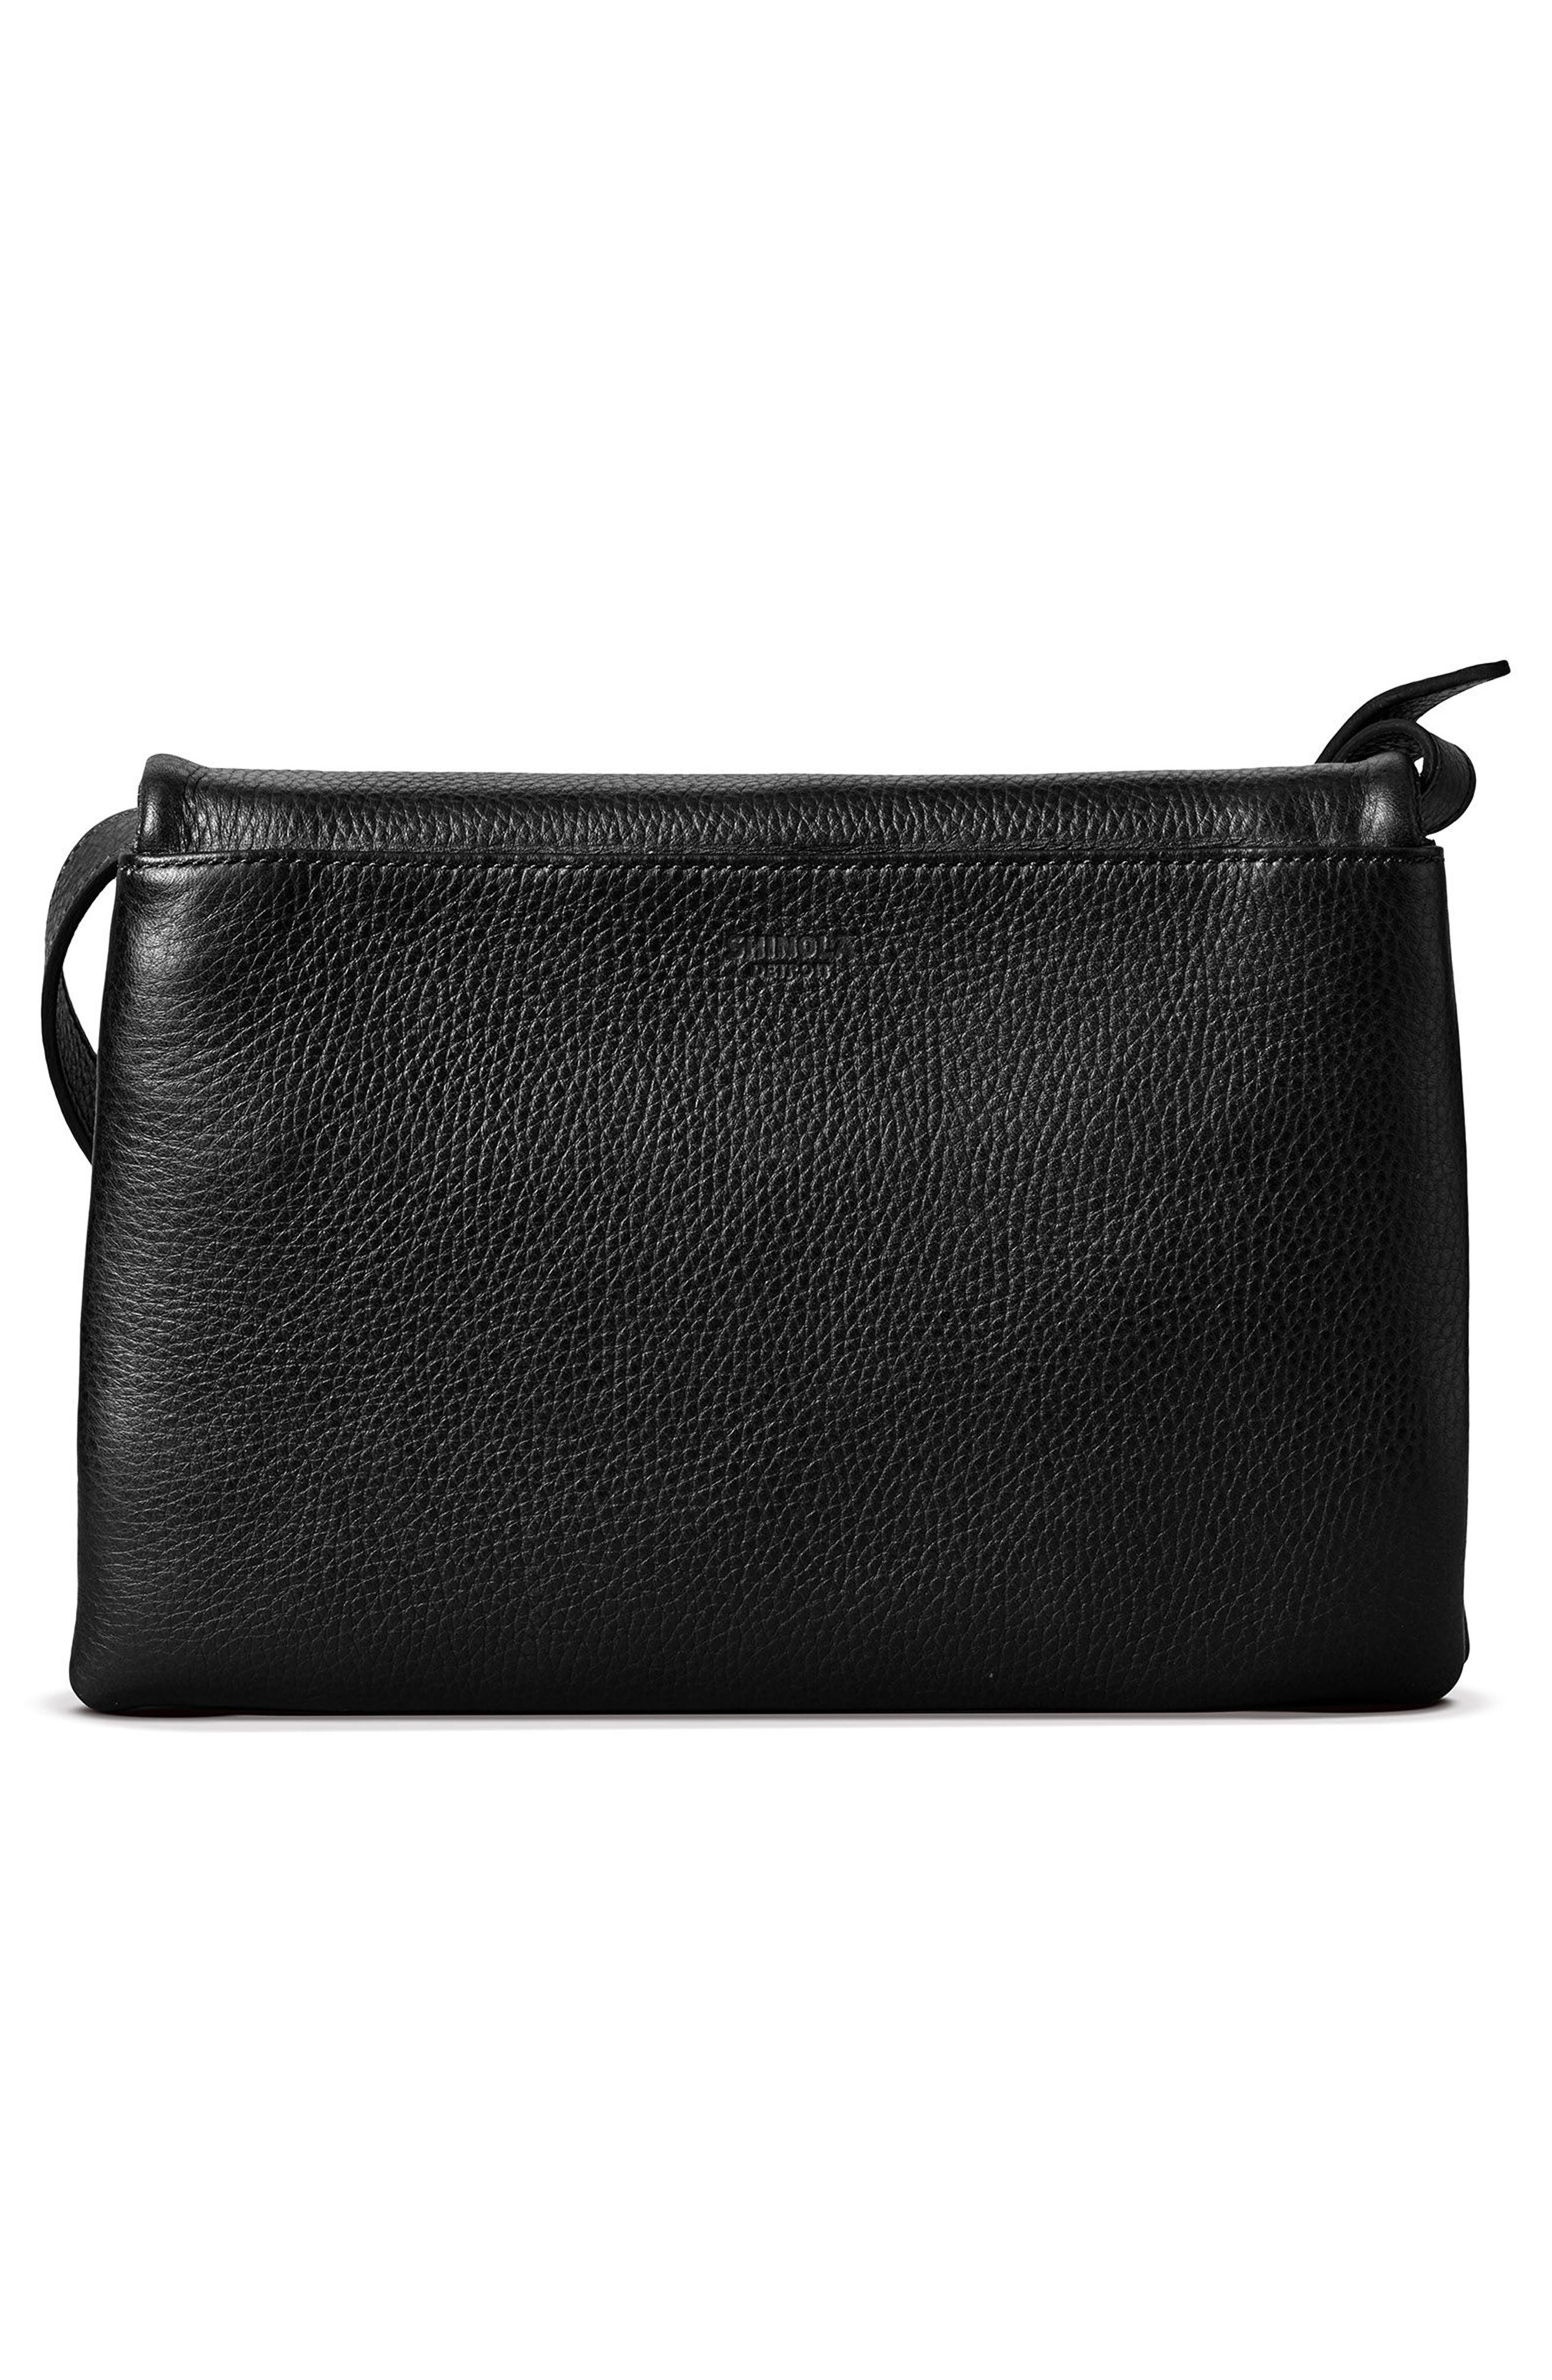 Leather Convertible Shoulder Bag,                             Alternate thumbnail 3, color,                             001